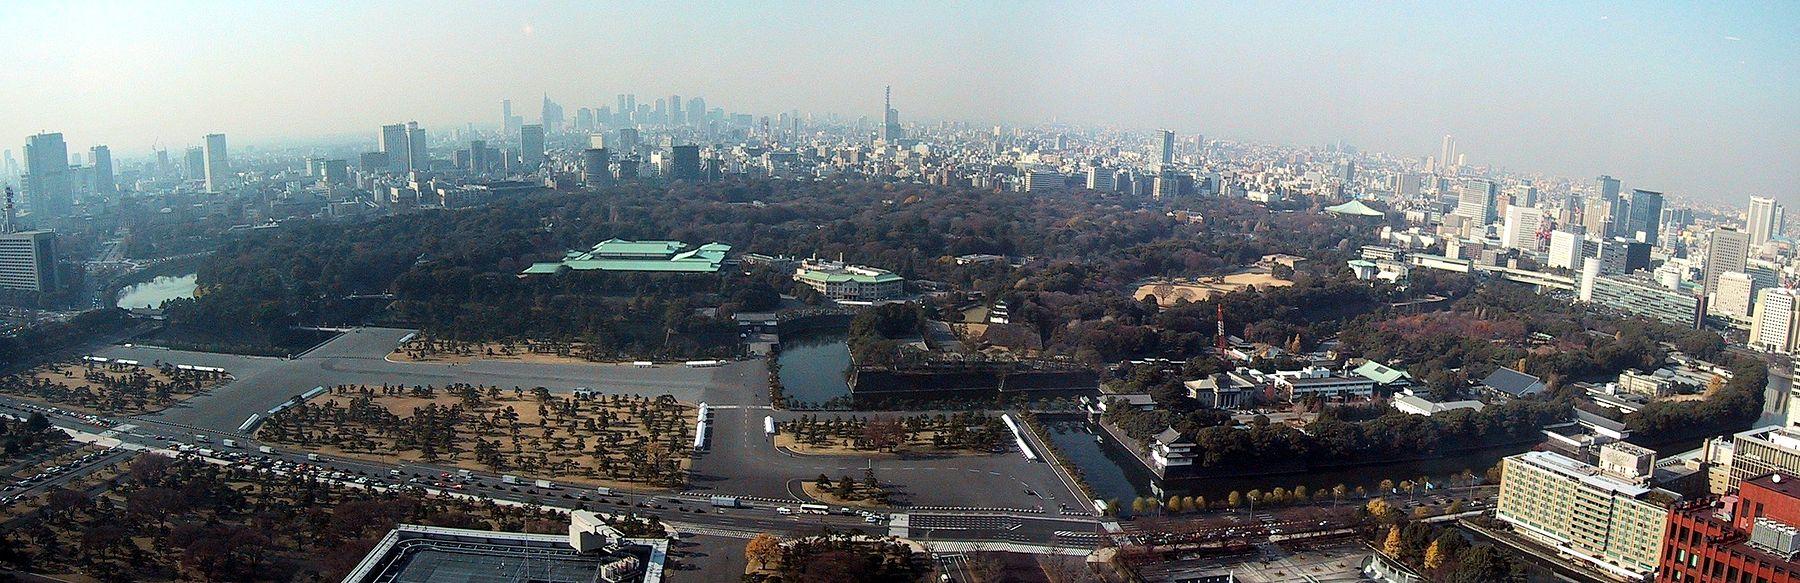 Imperial Palace Tokyo Panorama.jpg